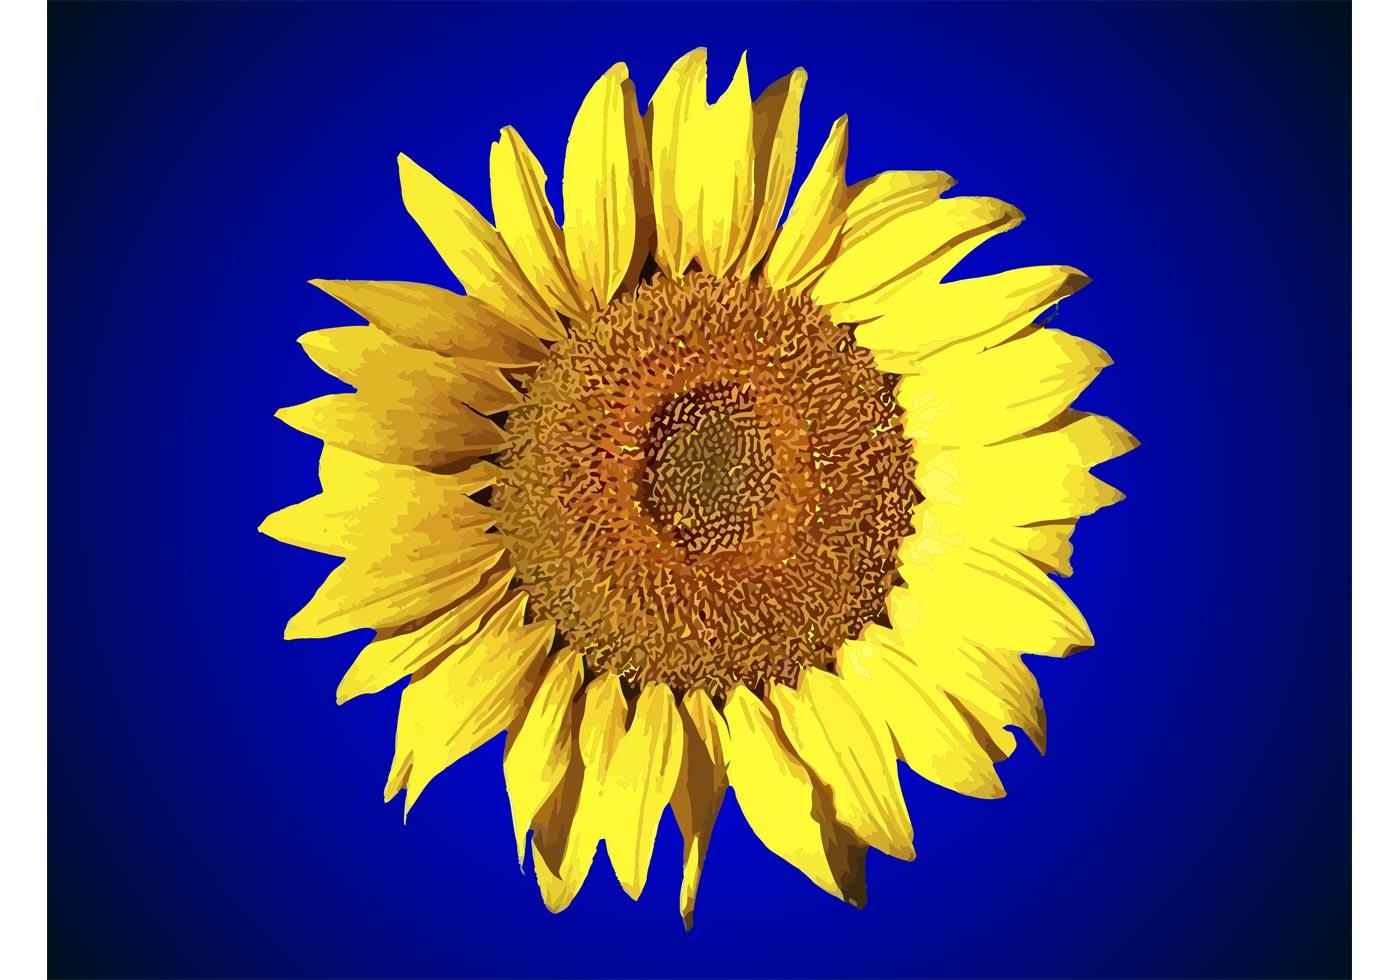 Sunflower Free Vector Art - (11371 Free Downloads)